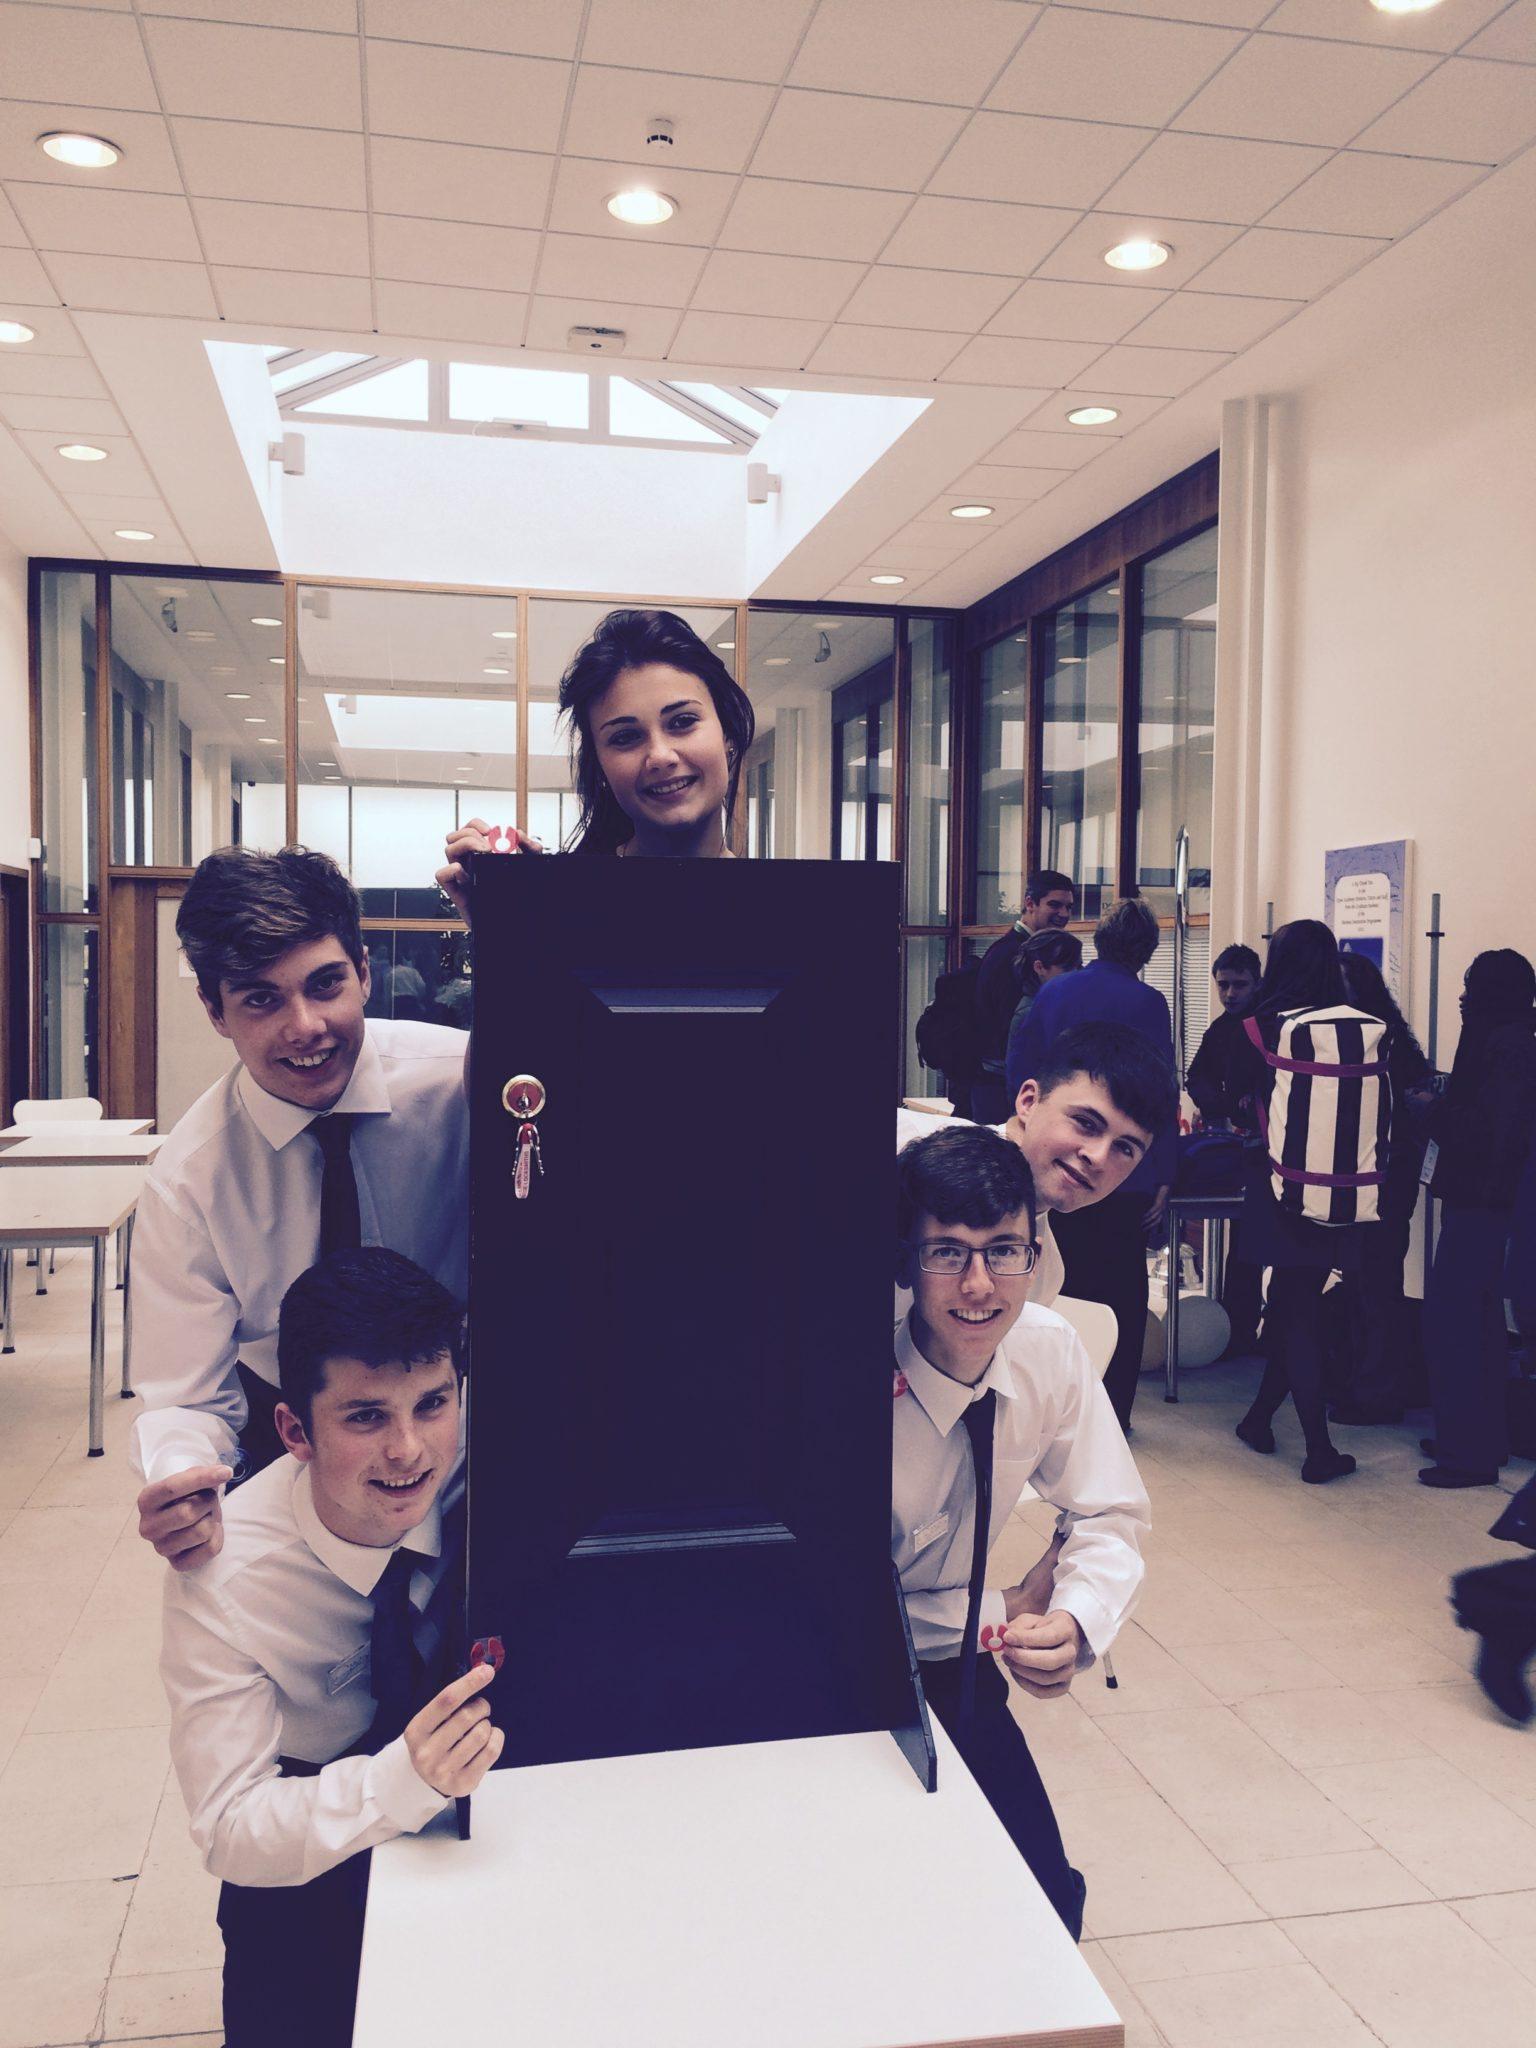 Junior Achievement Award Winners from Desmond College: Diarmuid Curtin, Seamus Hurley, Emma Herbert, Eoin Considine and Eamonn Browne